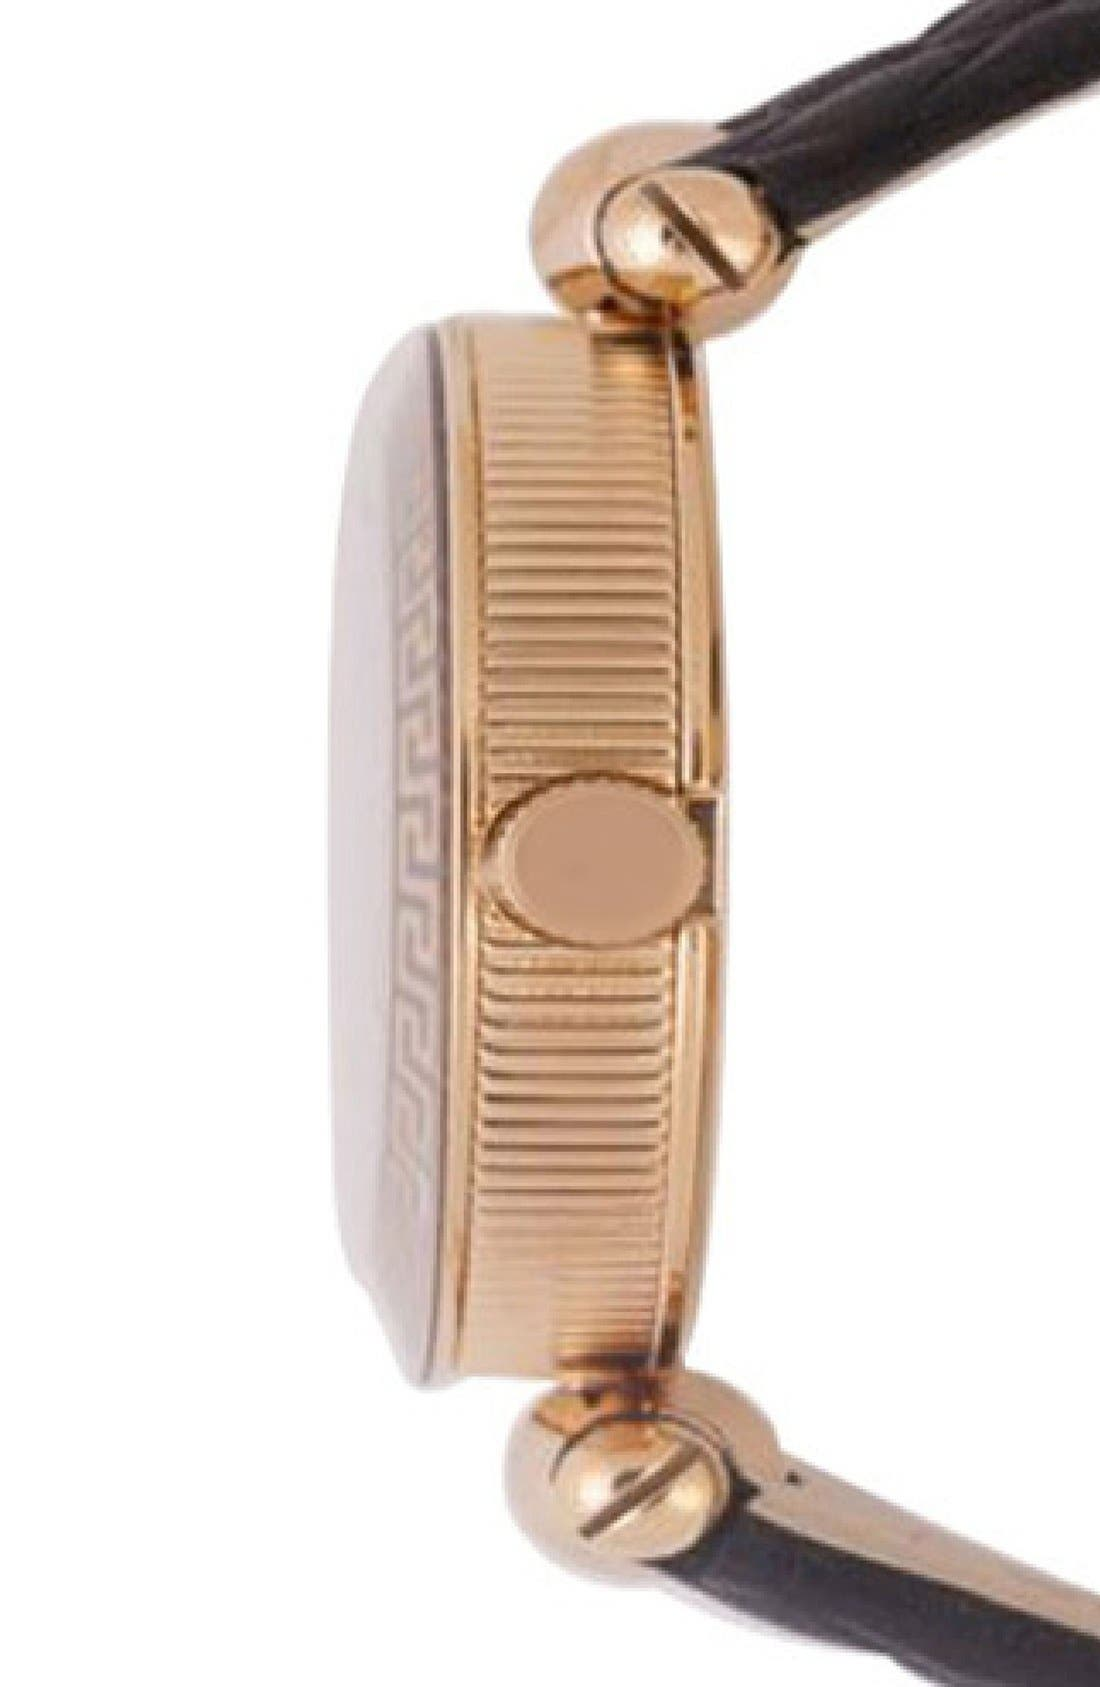 Alternate Image 3  - Versace 'Vanitas' Quilted Round Leather Strap Watch, 30mm